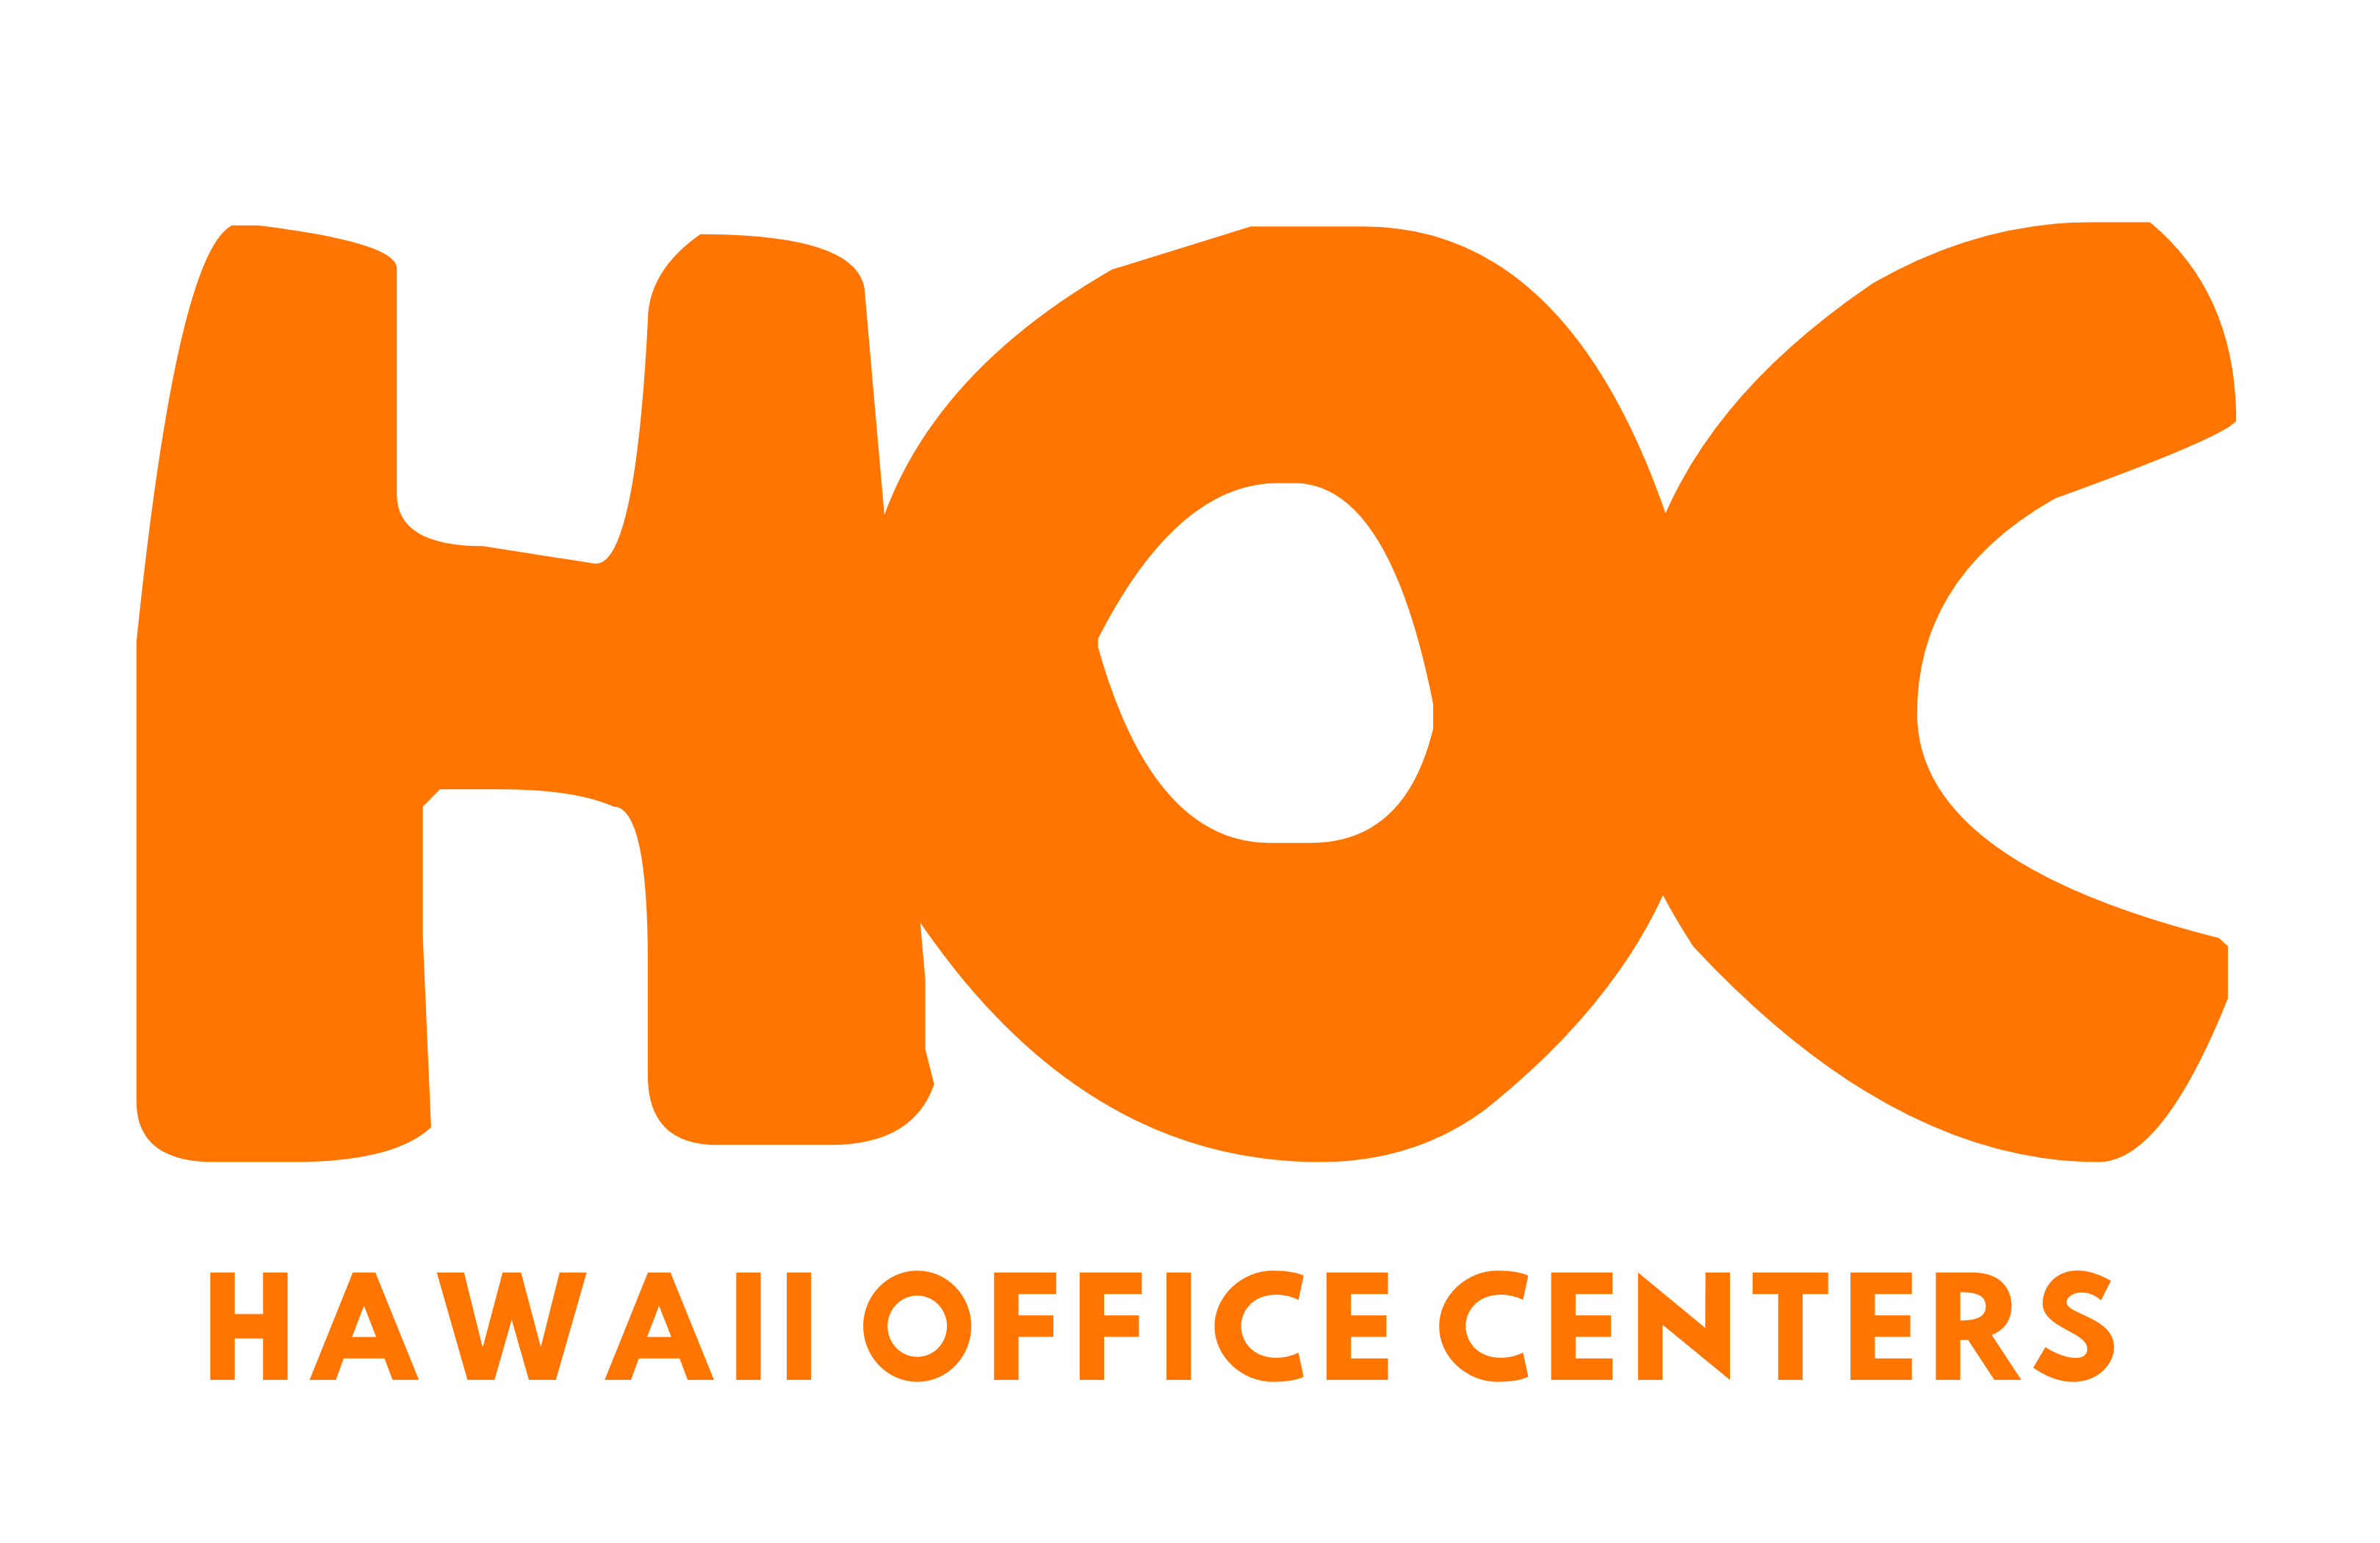 HAWAII OFFICE CENTERS